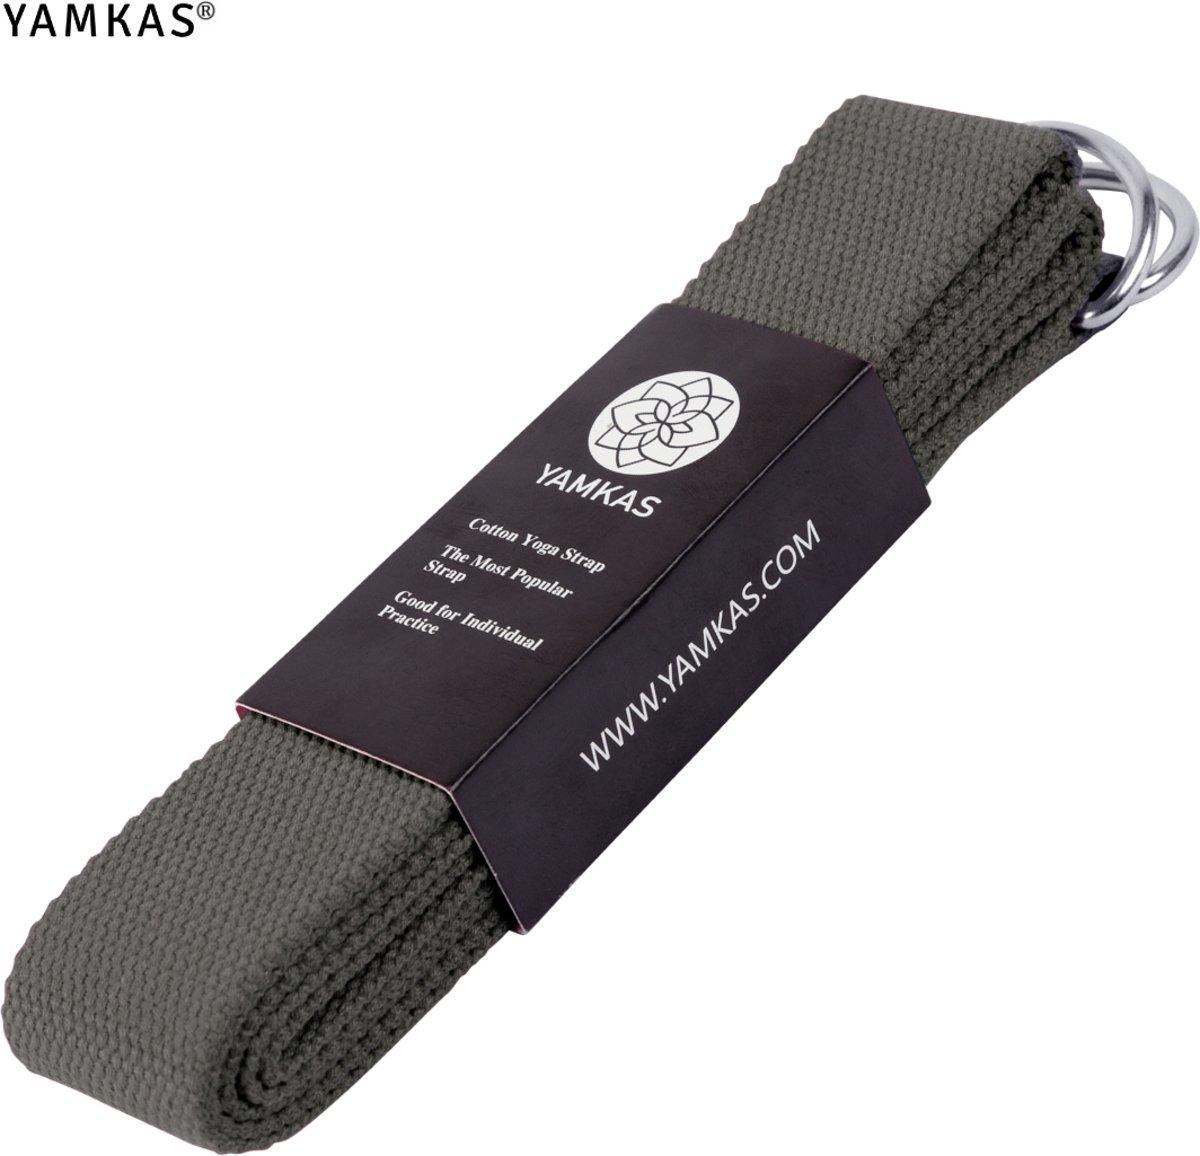 Yamkas Yoga Strap Donker Grijs 183cm - 100% Katoen